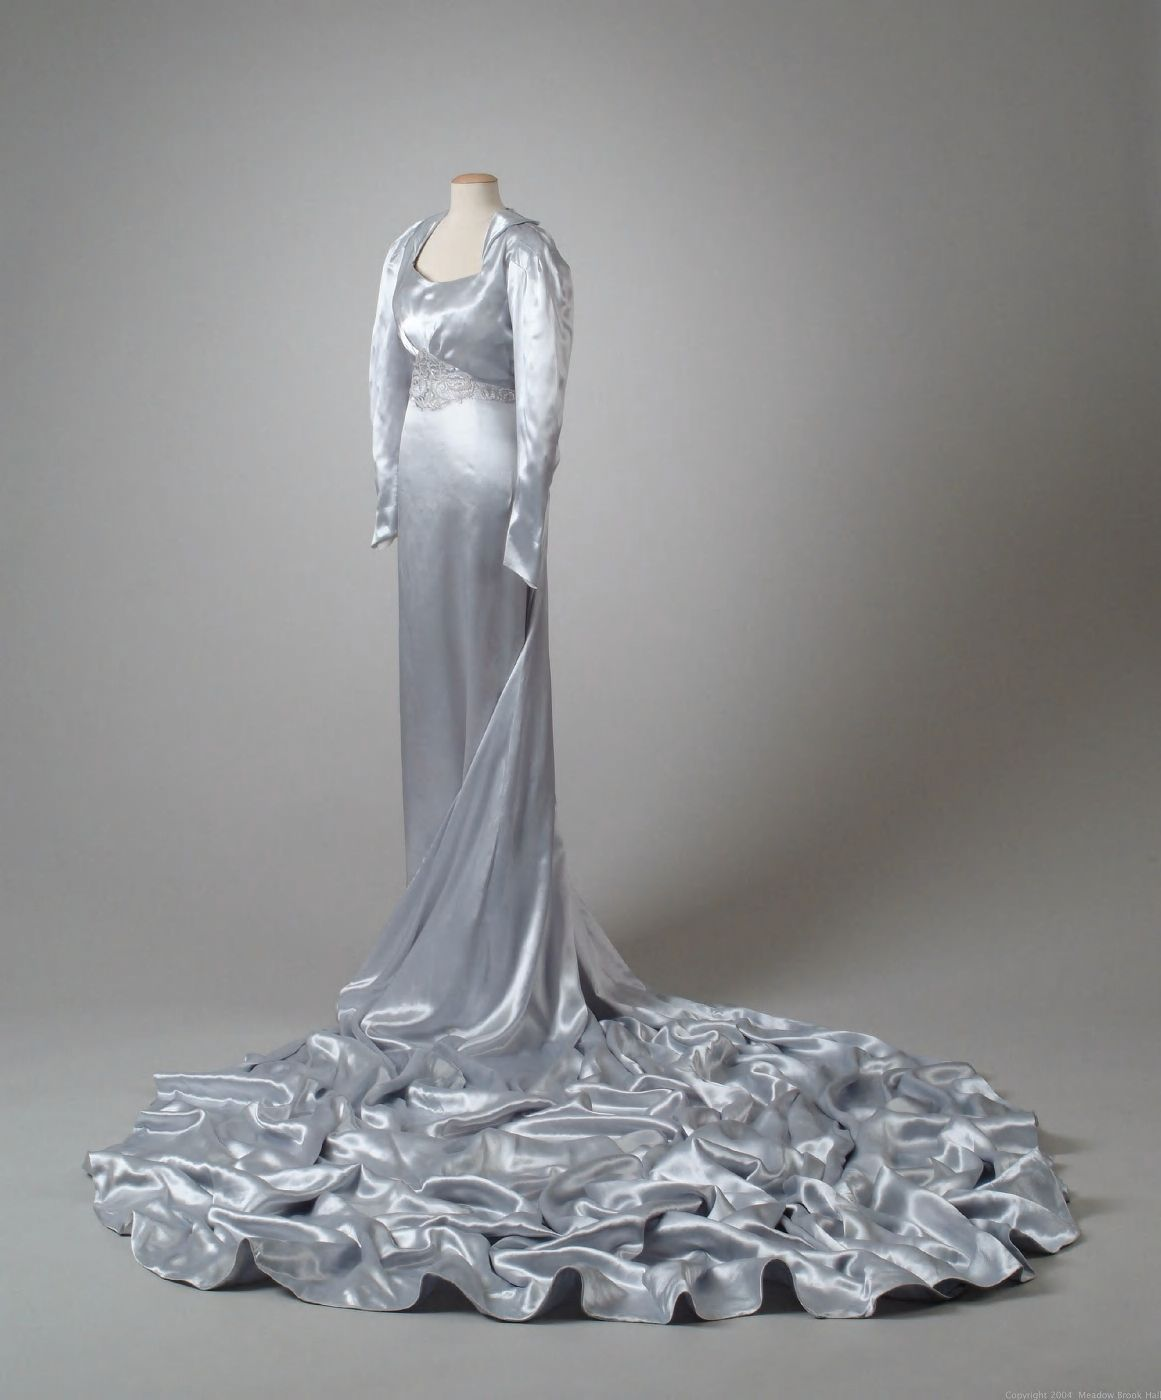 Iceblue silk satin wedding gown worn by dodge family heiress